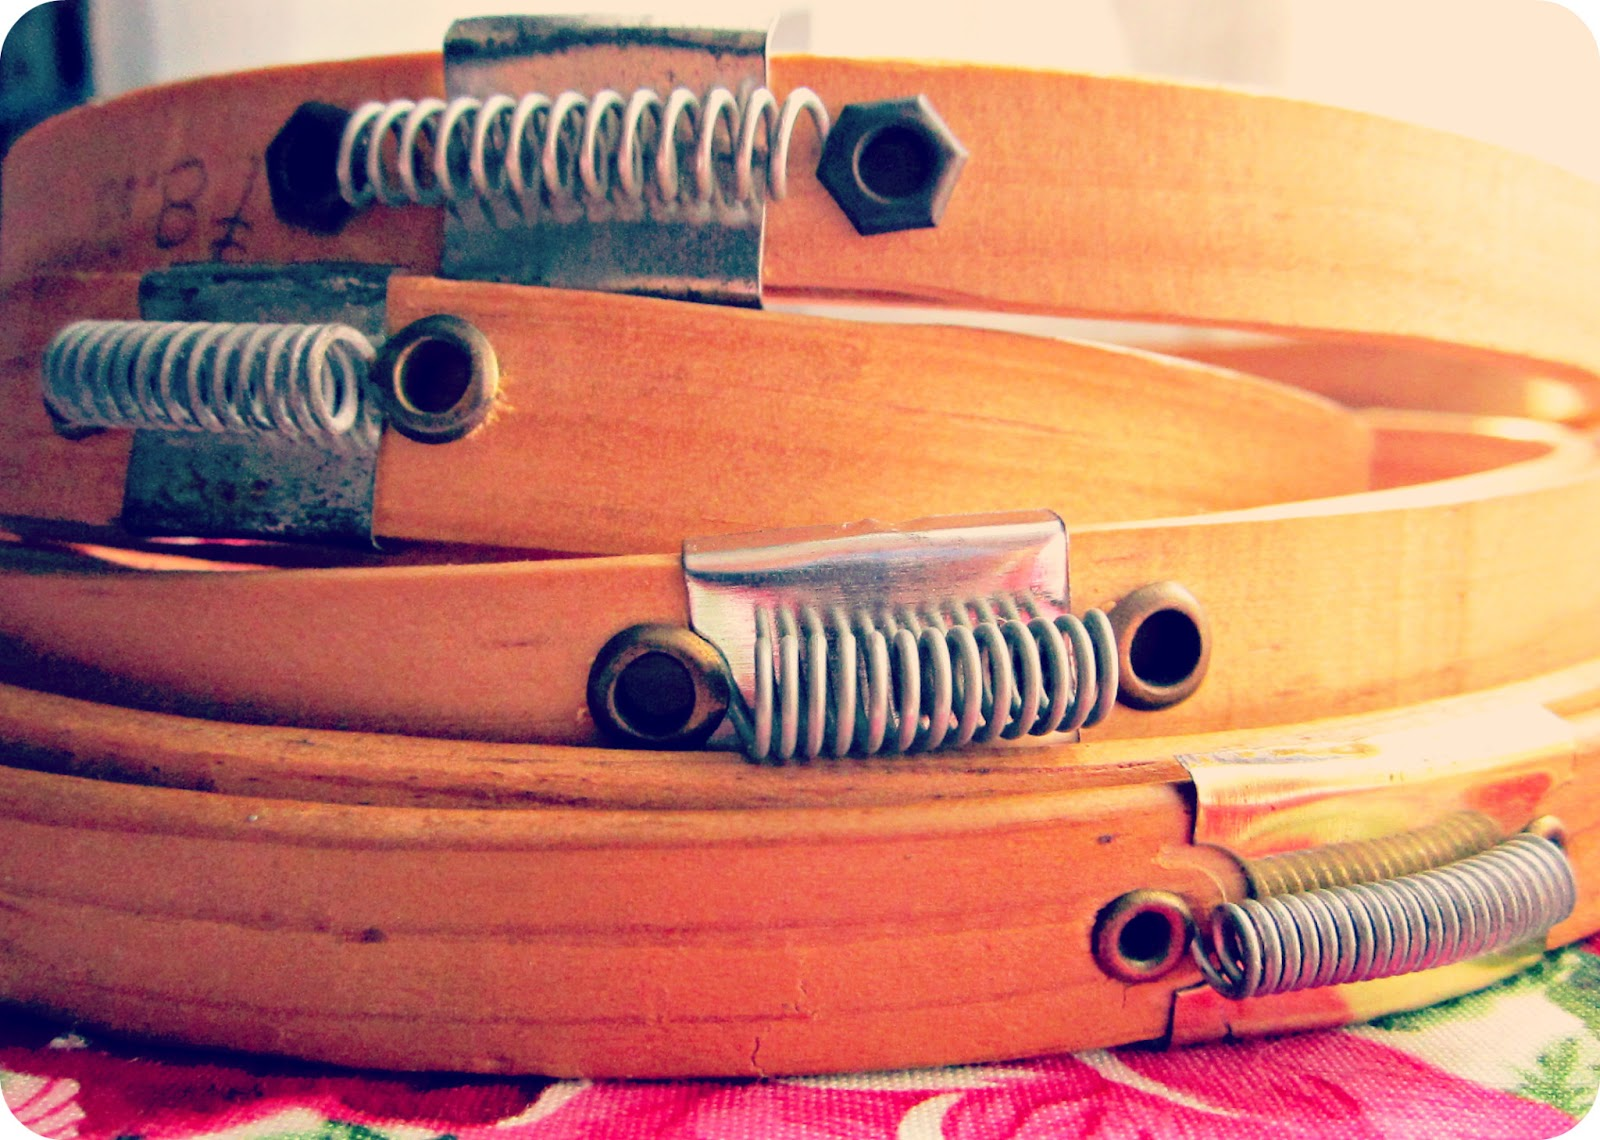 http://lluevediamantina.blogspot.mx/2013/01/me-gusta-mis-aros-de-bordar.html